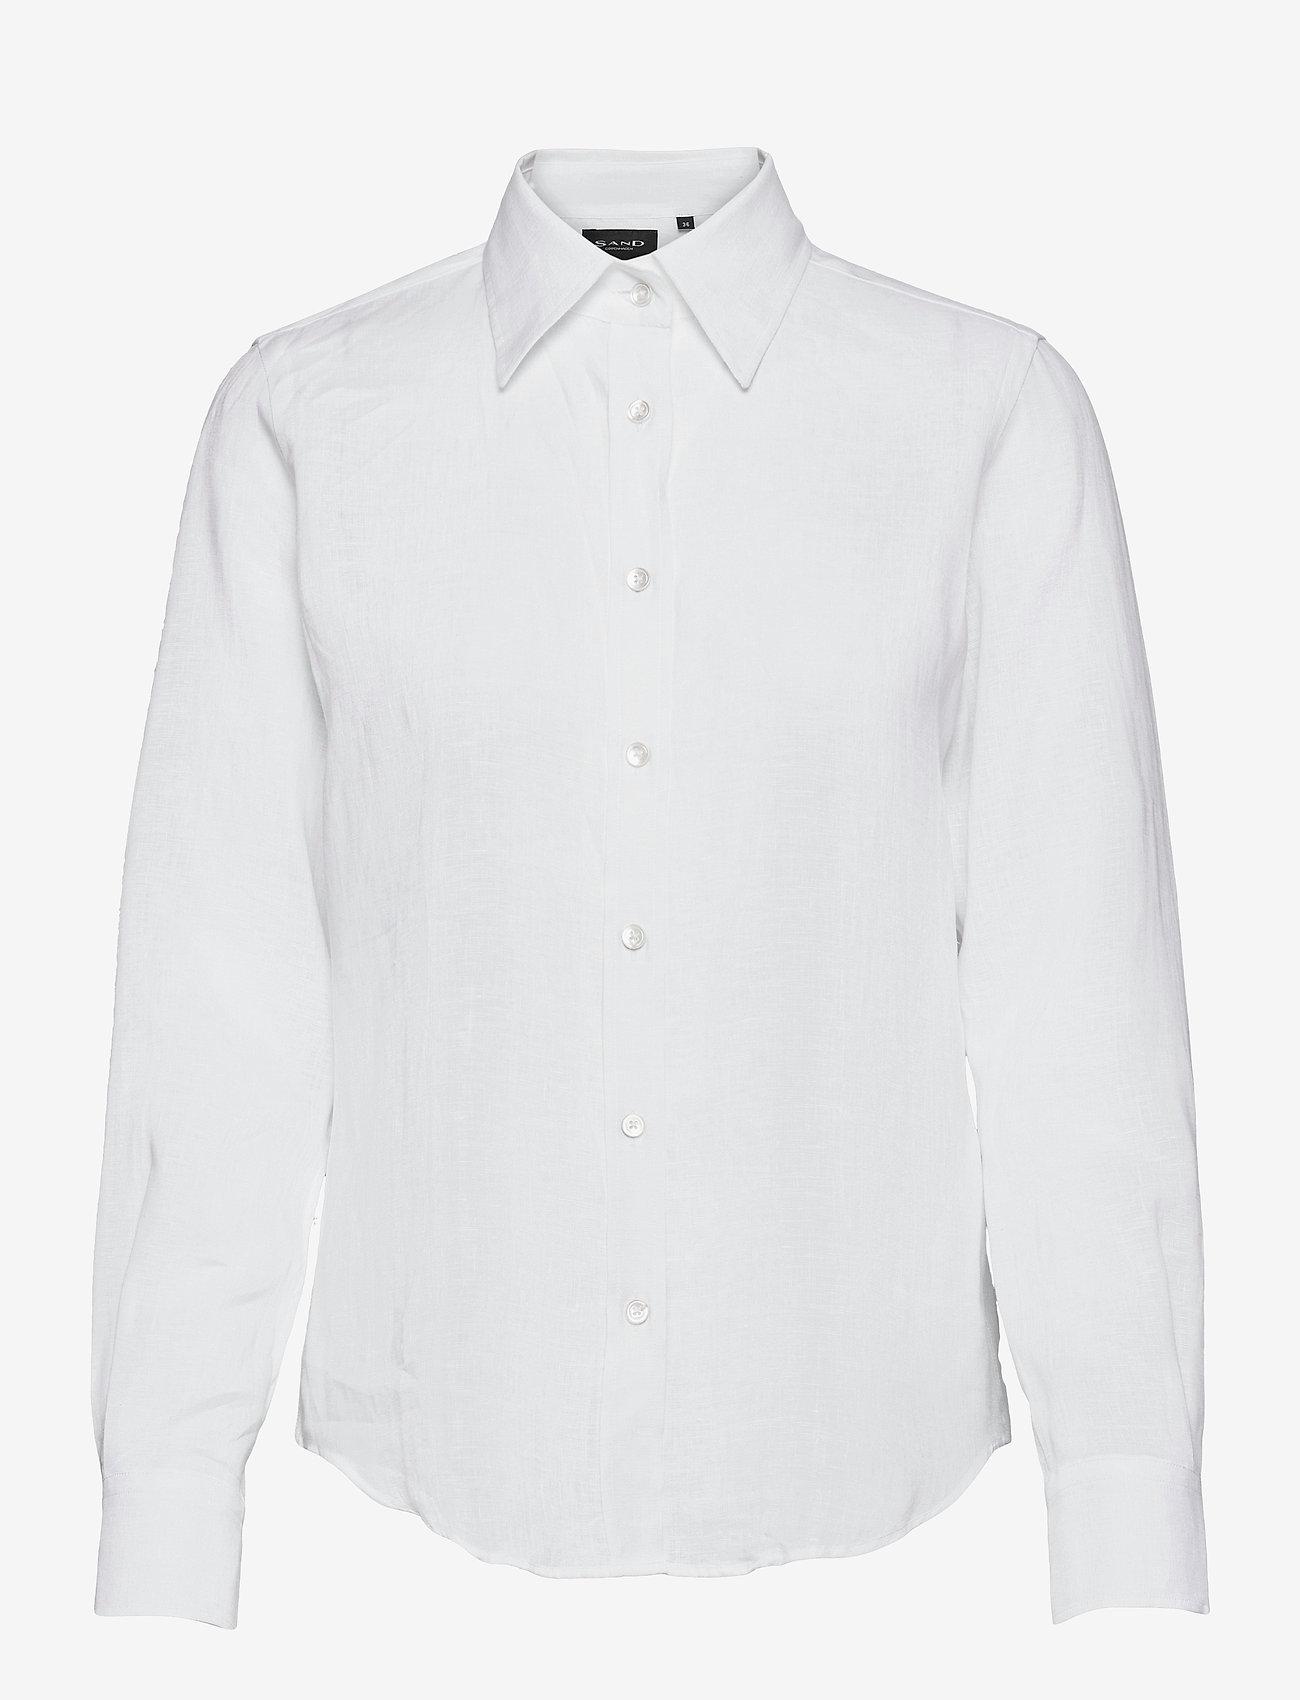 SAND - 8727 W - Sandie New - overhemden met lange mouwen - optical white - 0